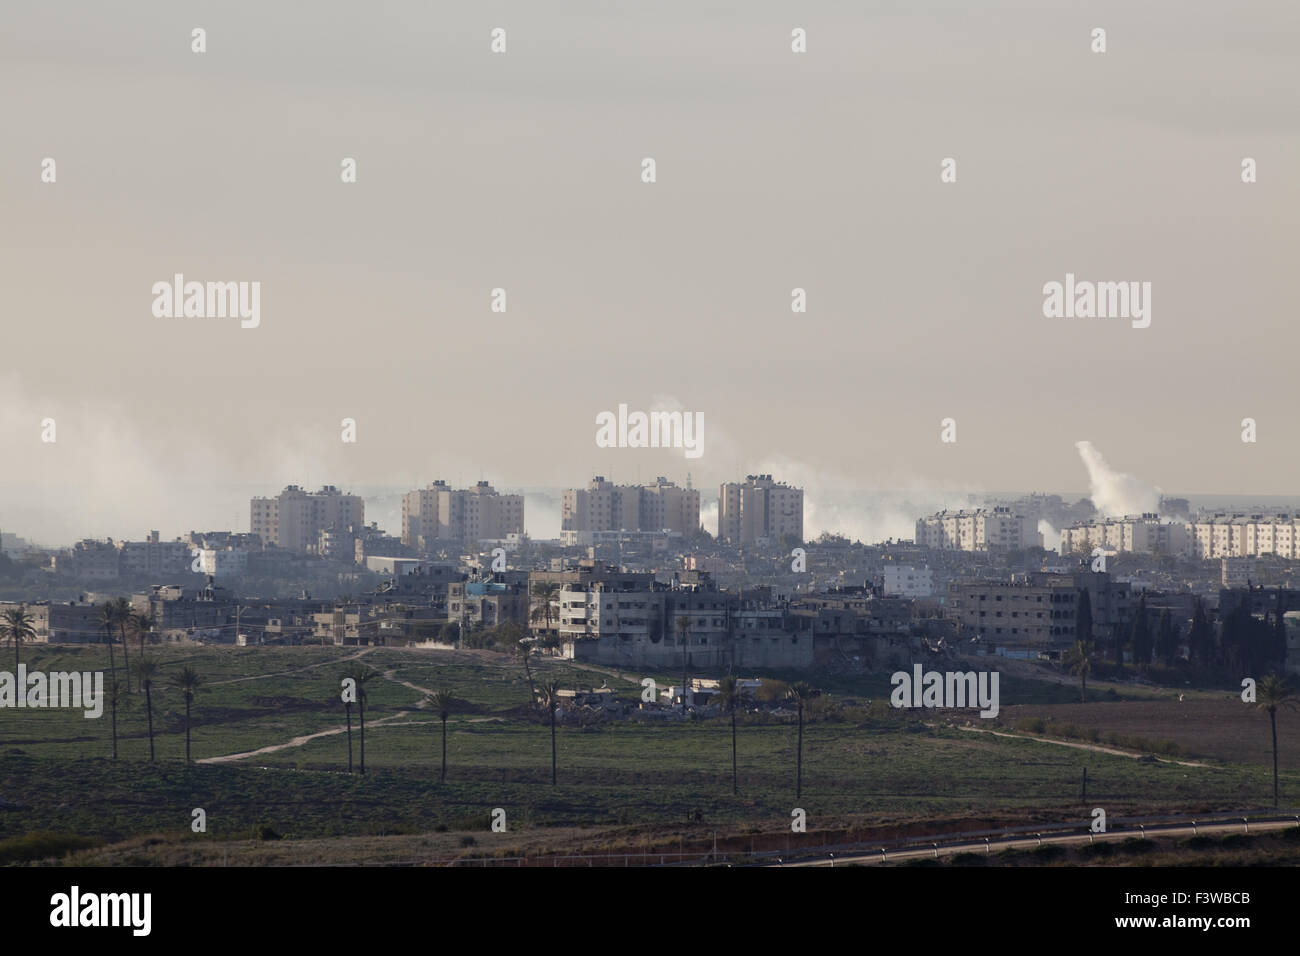 gaza strip photo